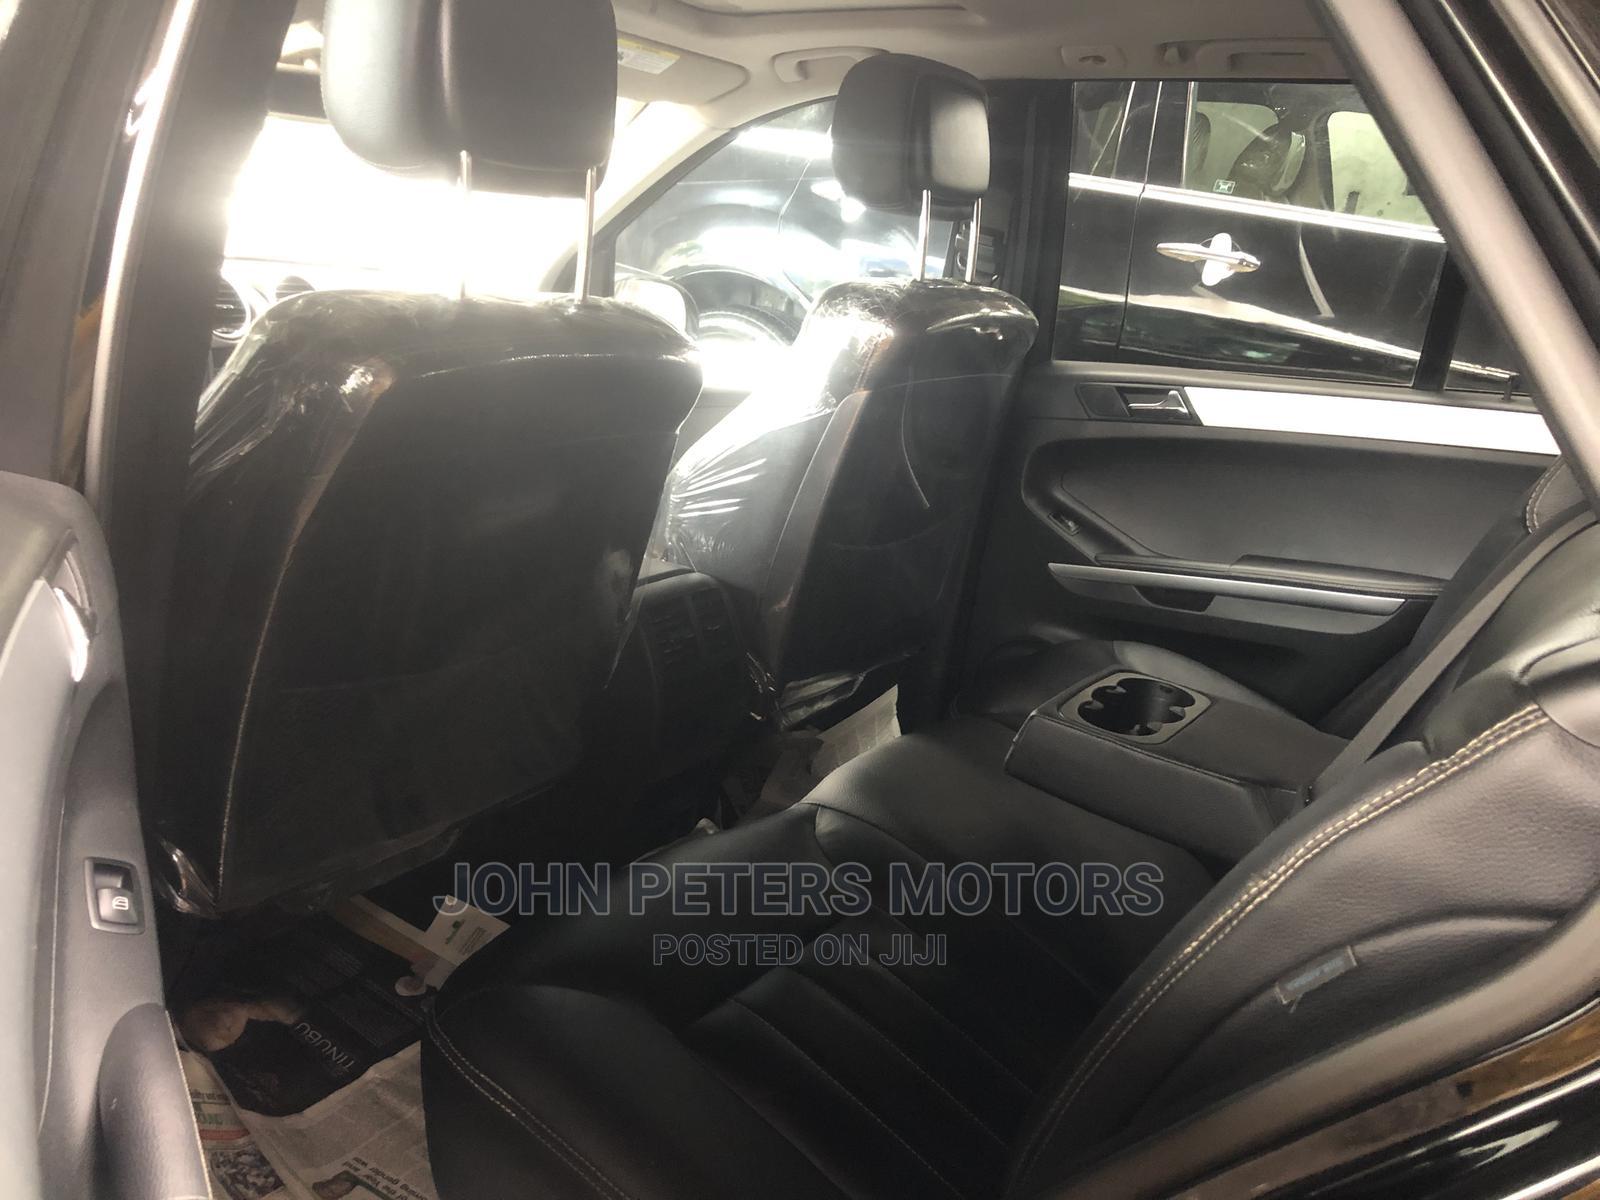 Mercedes-Benz M Class 2007 ML 350 4Matic Black | Cars for sale in Apapa, Lagos State, Nigeria